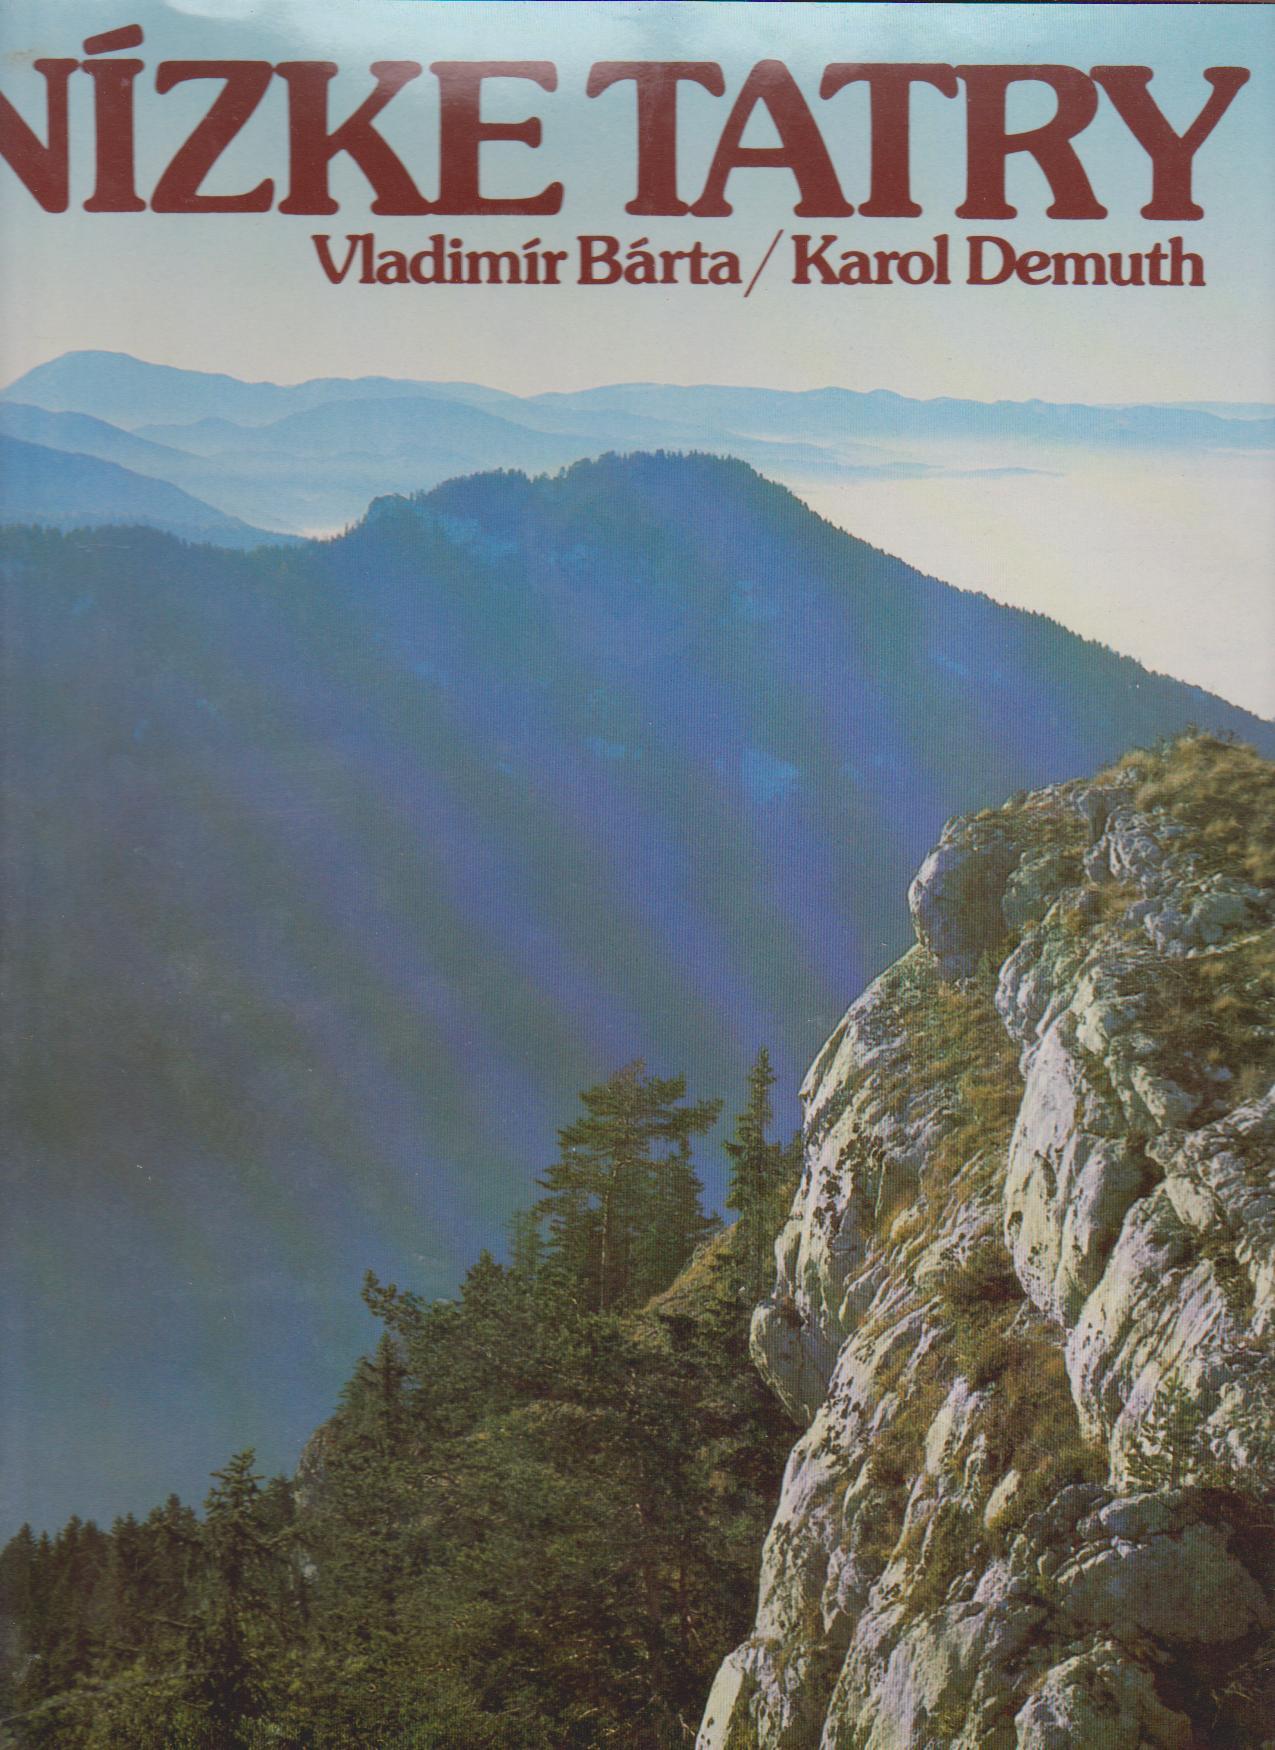 Nízké Tatry - Vladimír Bárta, Karol Demuth (slovensky)